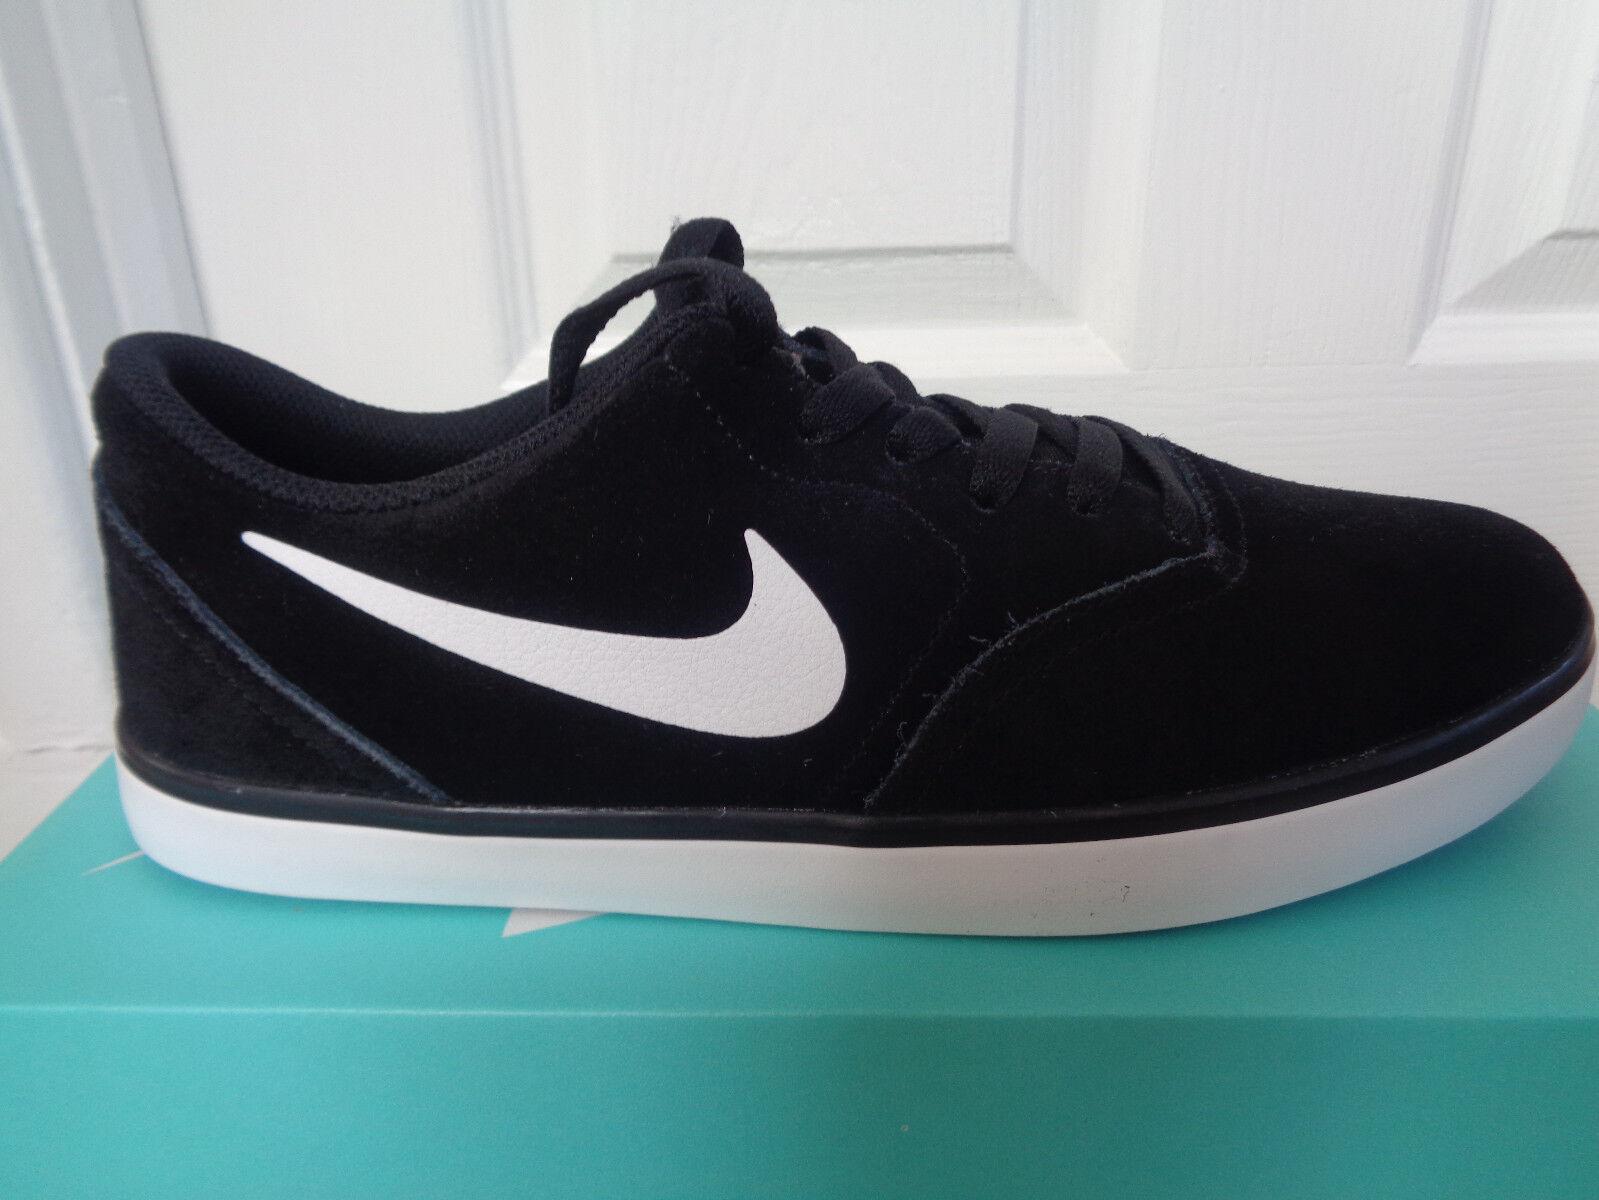 Nike SB Check trainers Turnschuhe schuhe 705265 006 uk 8.5 eu 43 us 9.5 NEW+BOX